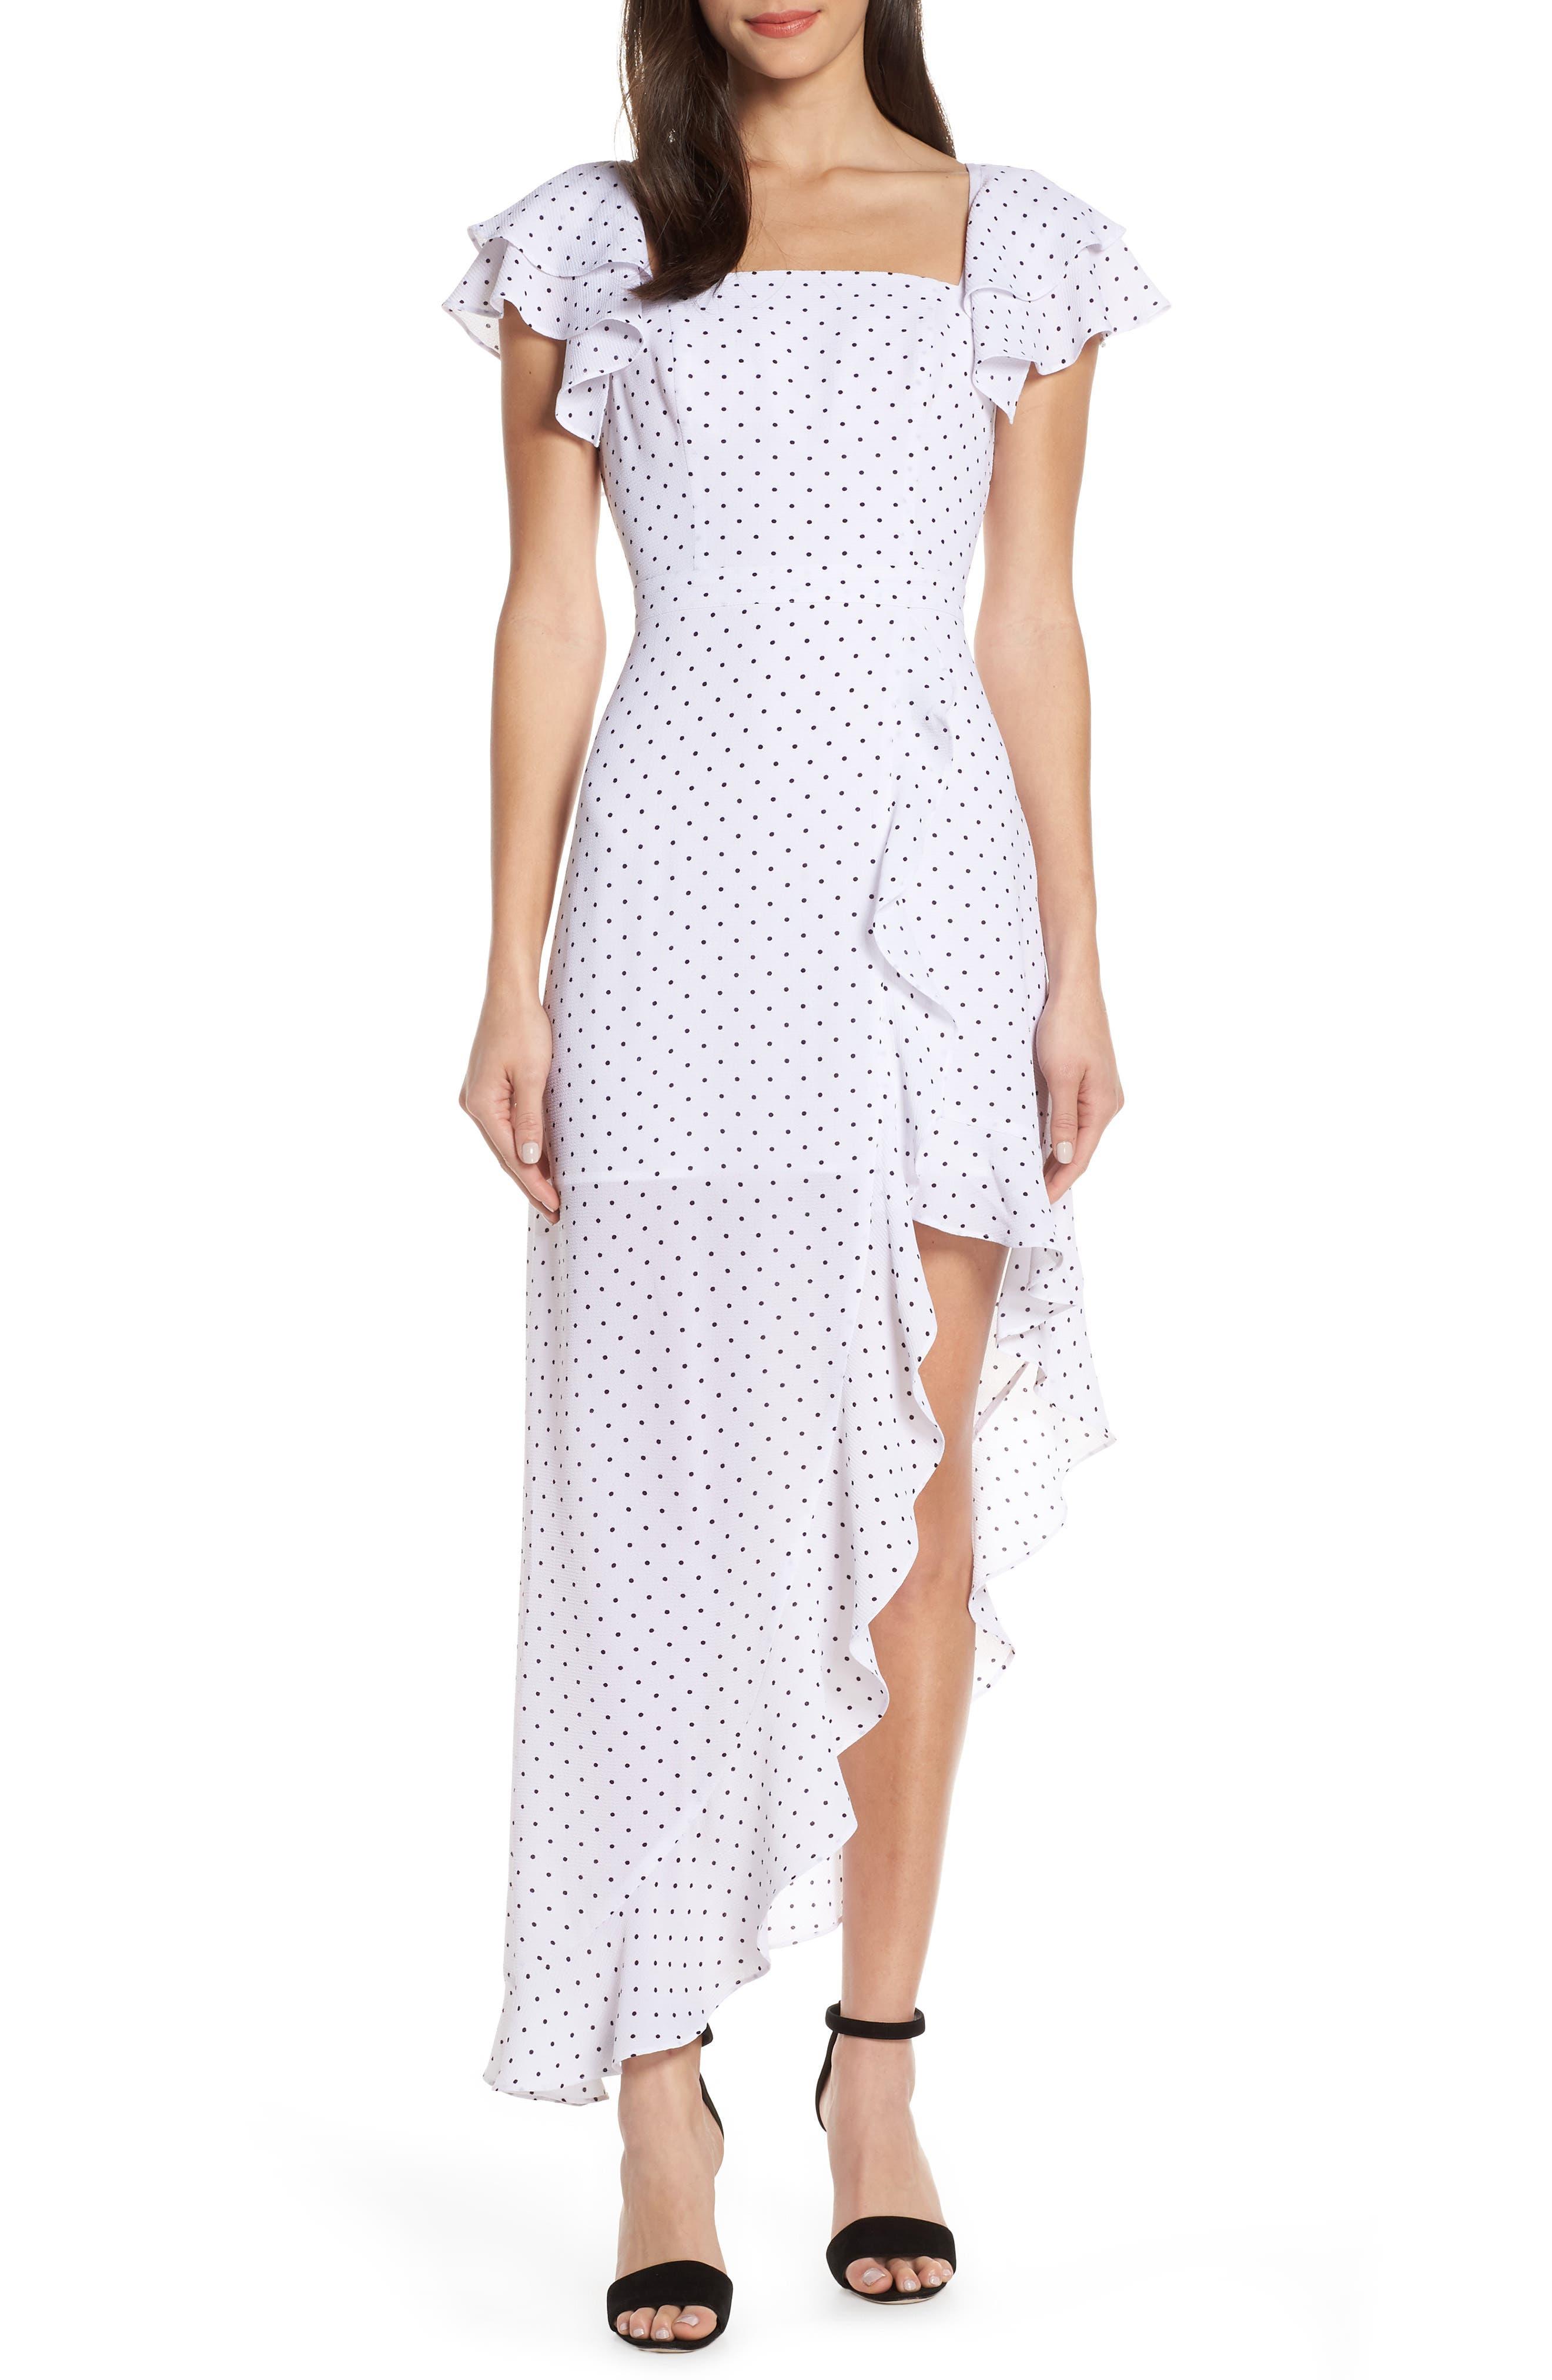 ALI & JAY Terrace Time Polka Dot Maxi Dress, Main, color, 100